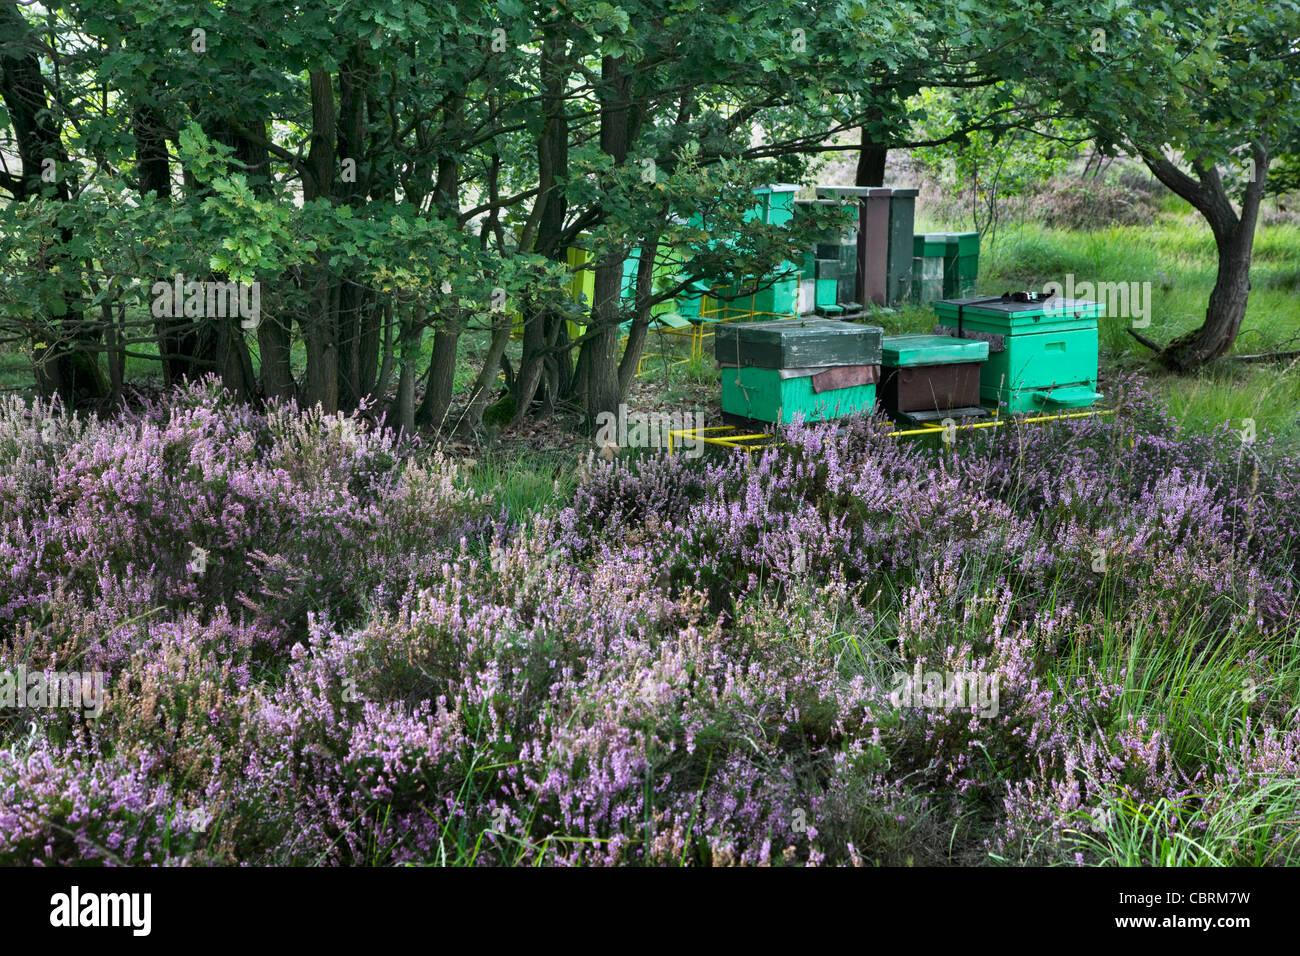 Beehives in purple heathland in summer at the Hoge Kempen National Park, Belgium - Stock Image